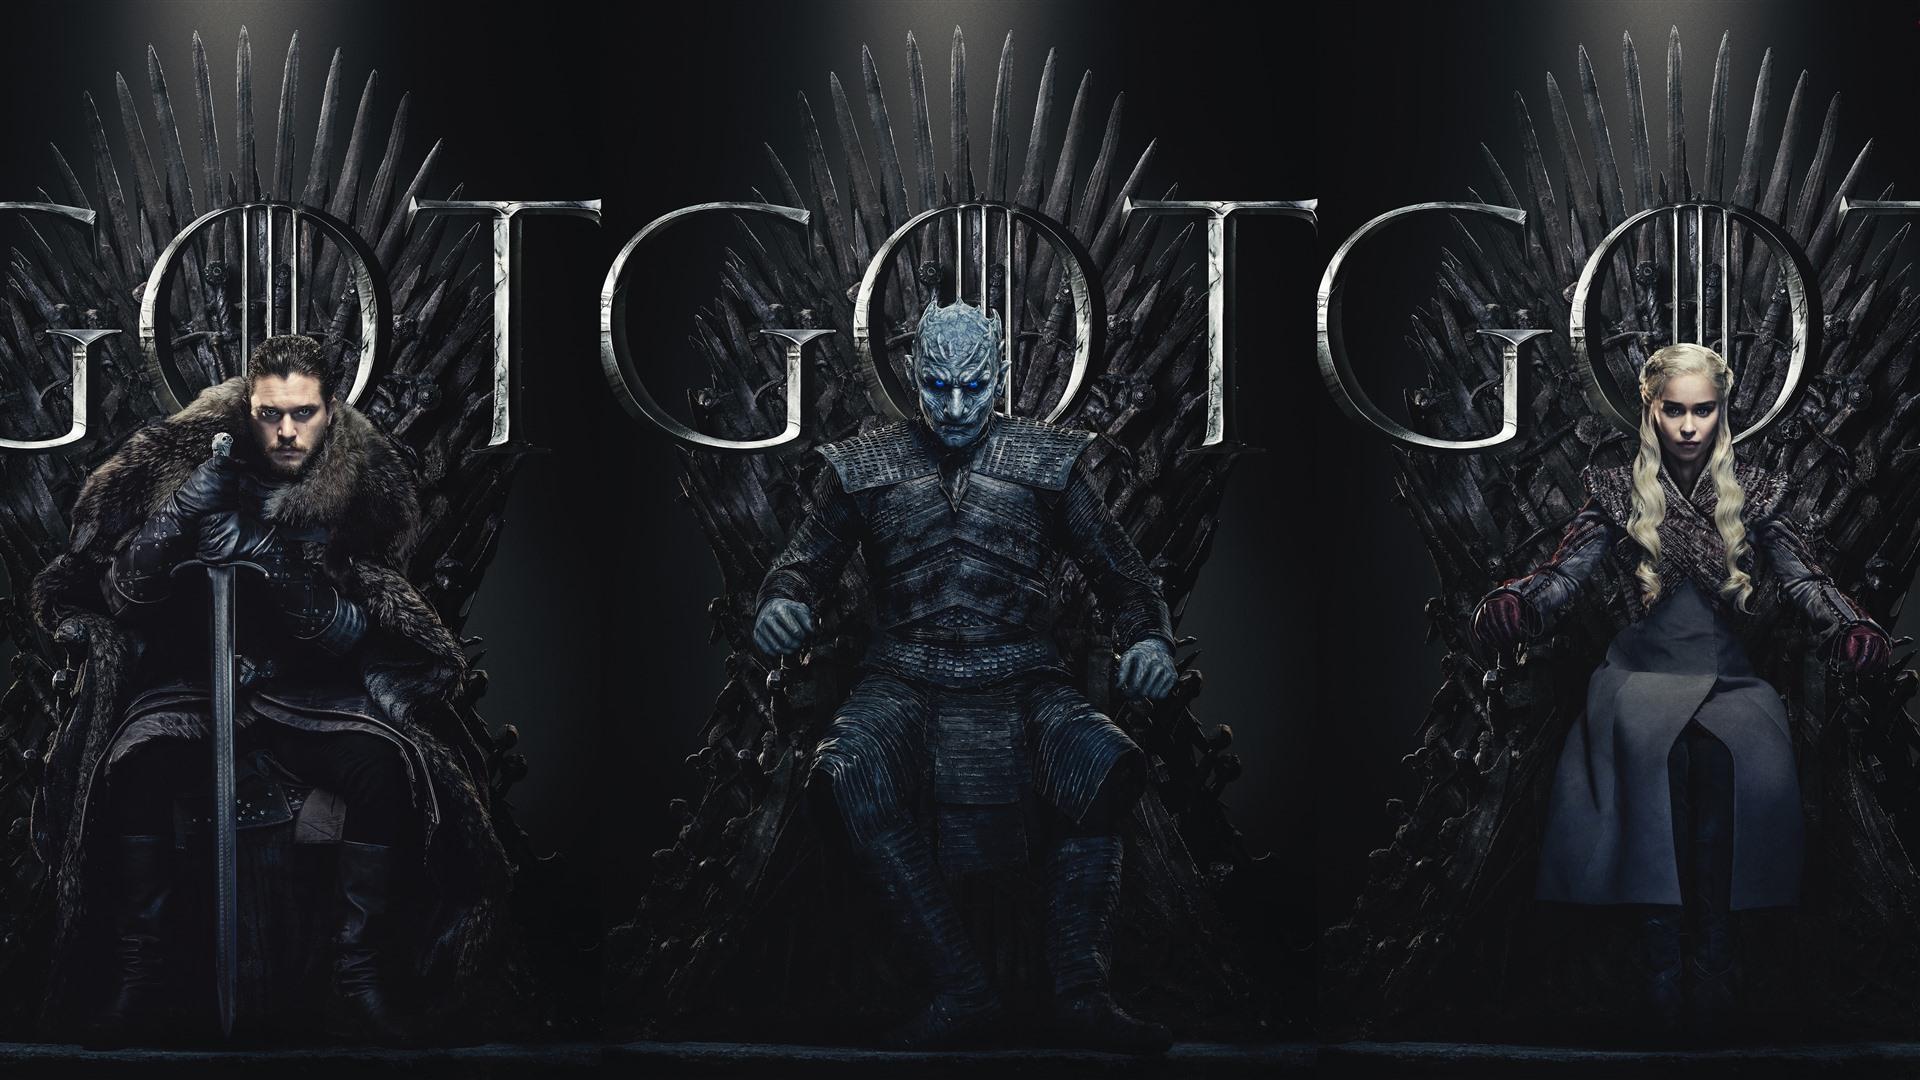 Game Of Thrones Heiße Fernsehserie 3840x2160 Uhd 4k